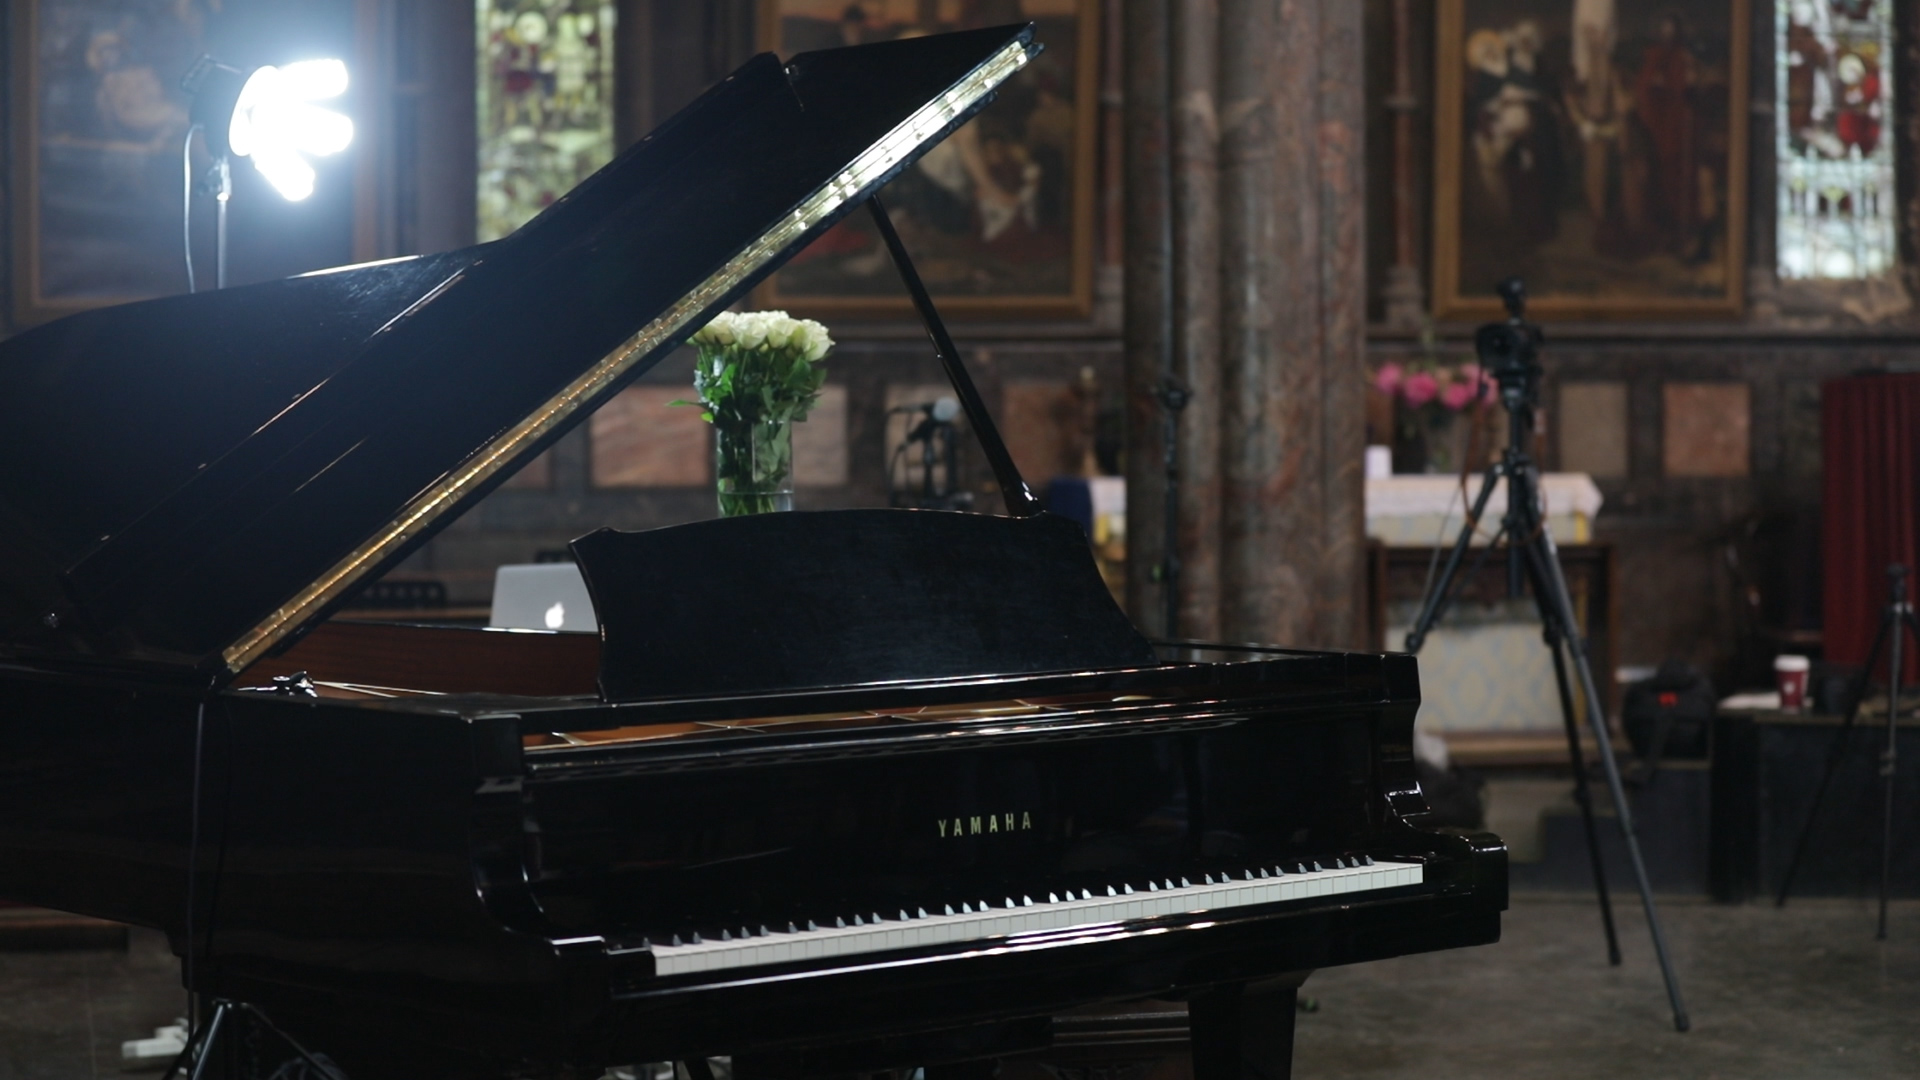 Piano Pieces Analysis: Evaded cadences